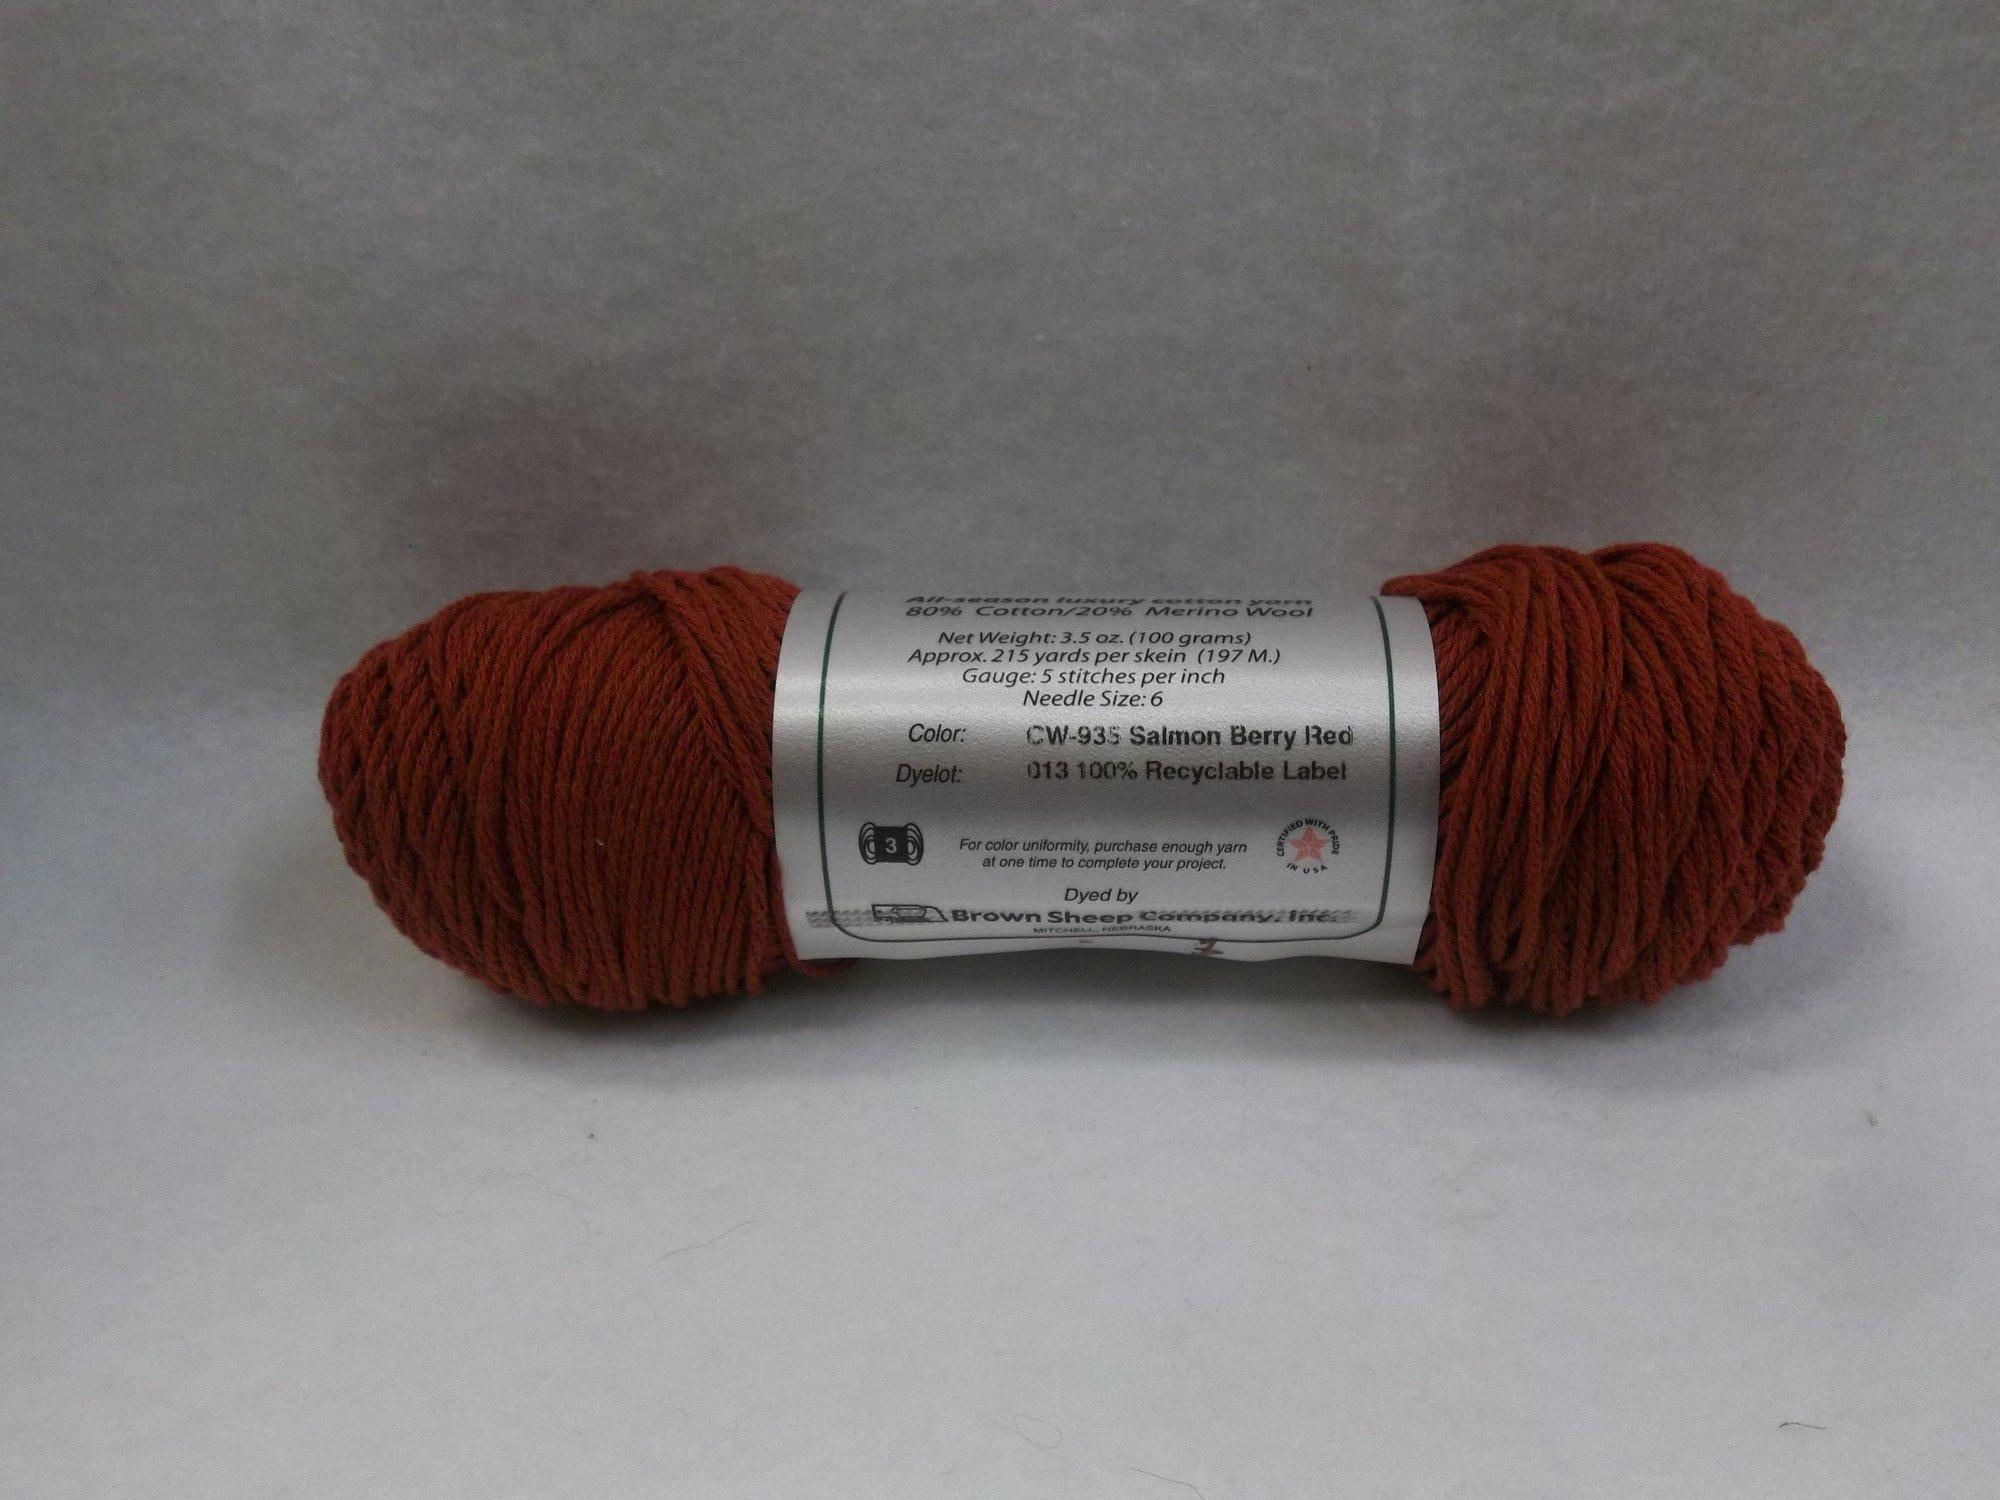 Cotton Fleece - CW-935 Salmon Berry Red